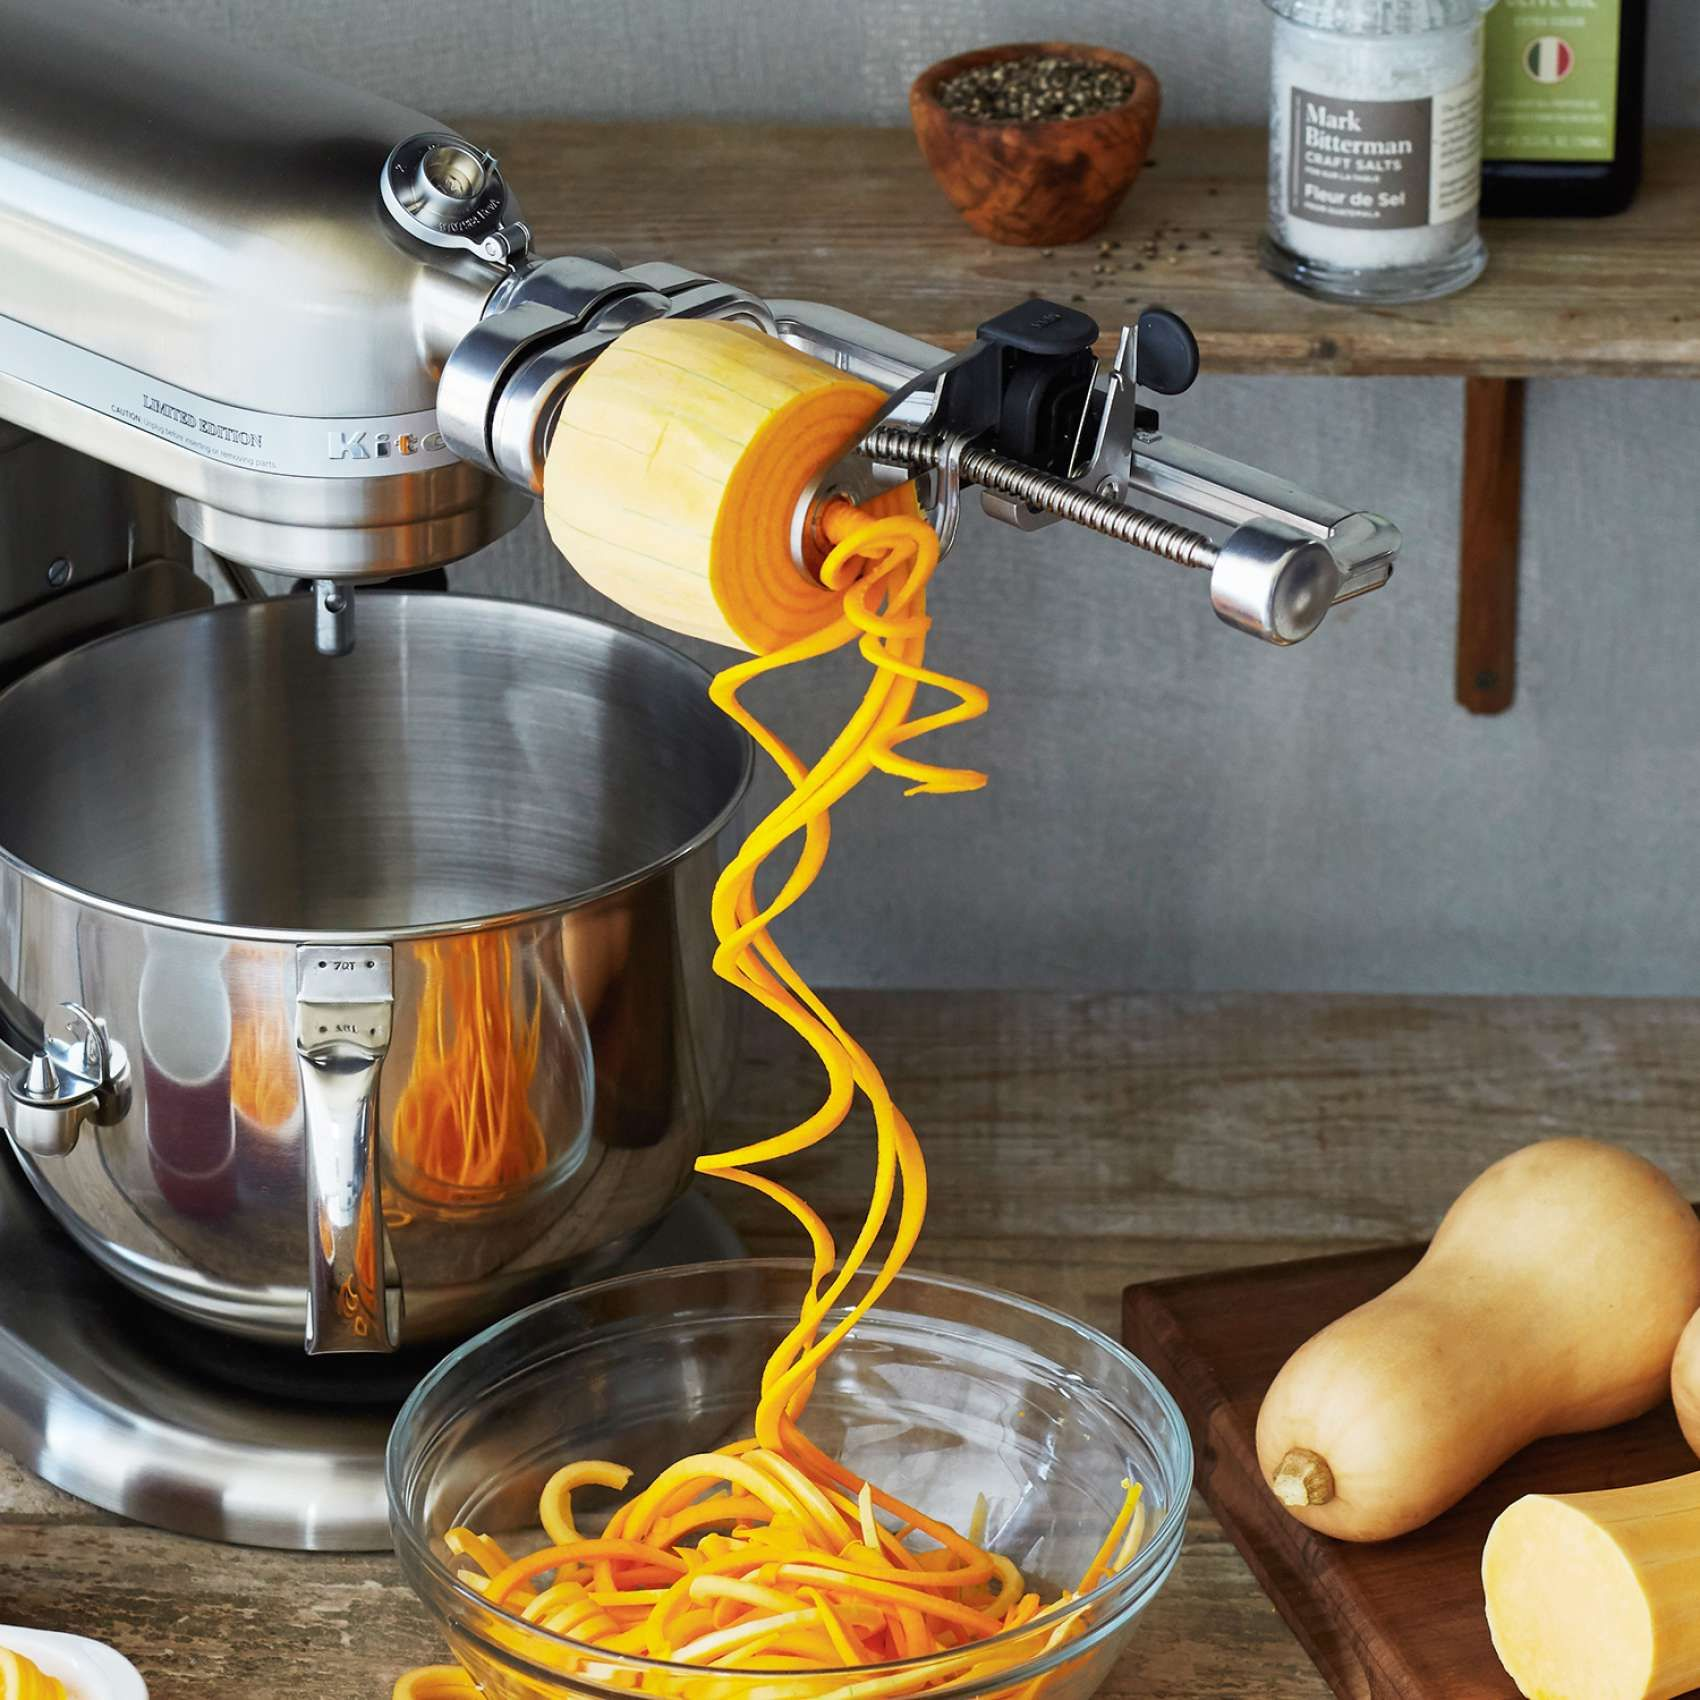 Kitchenaid 174 Spiralizer Attachment Kitchen Aid Recipes